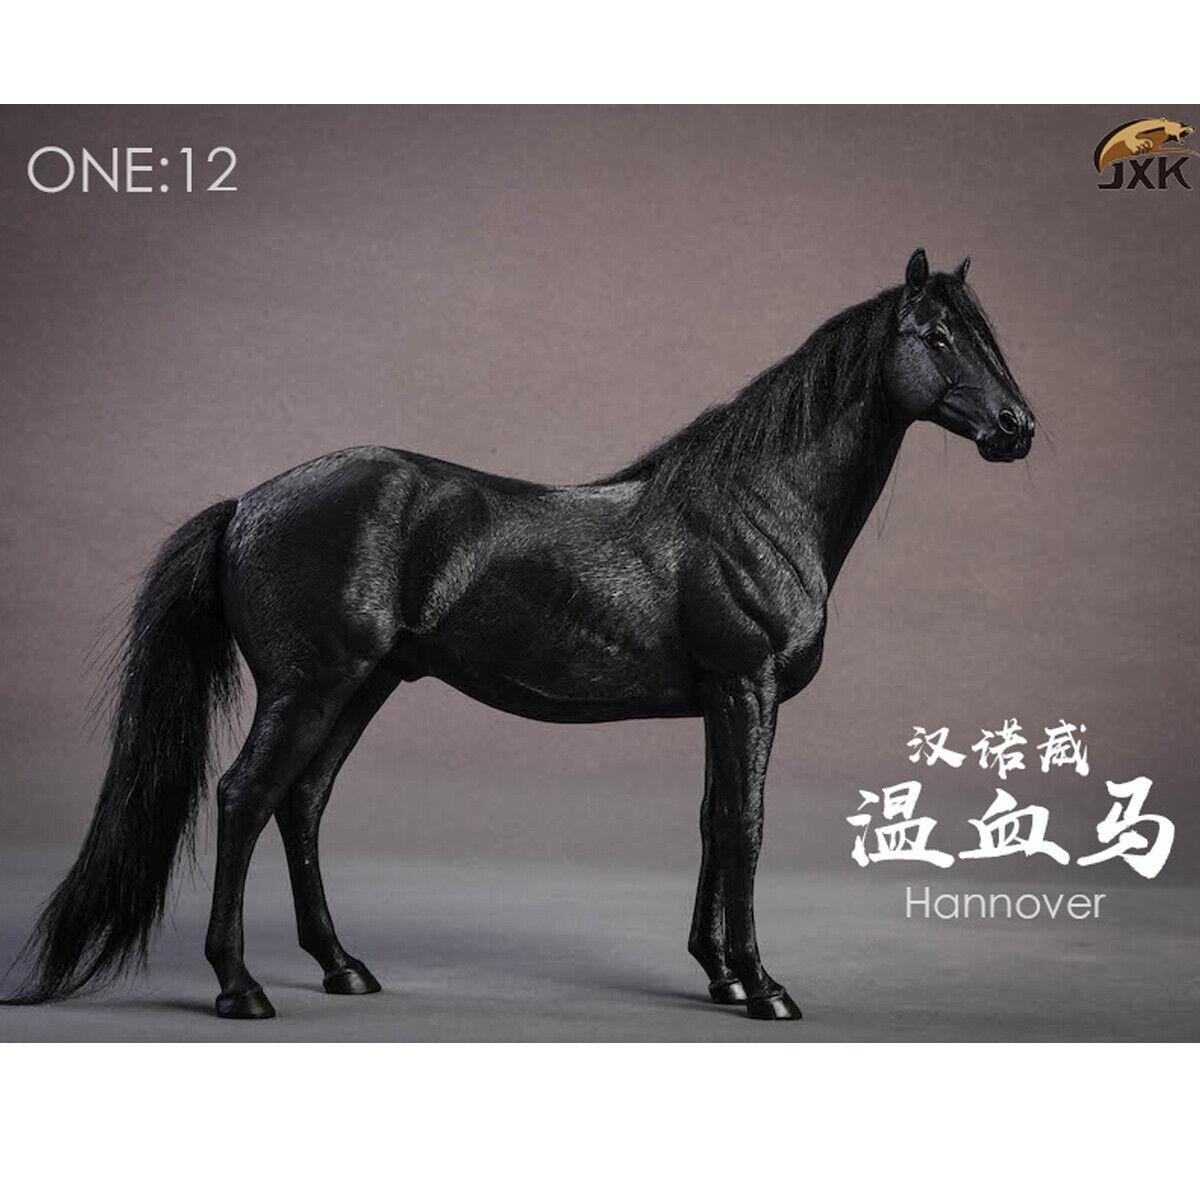 JXK Studio JXK013E 1 12 Scale Germany Hannover Animal Hanoverian Horse Model